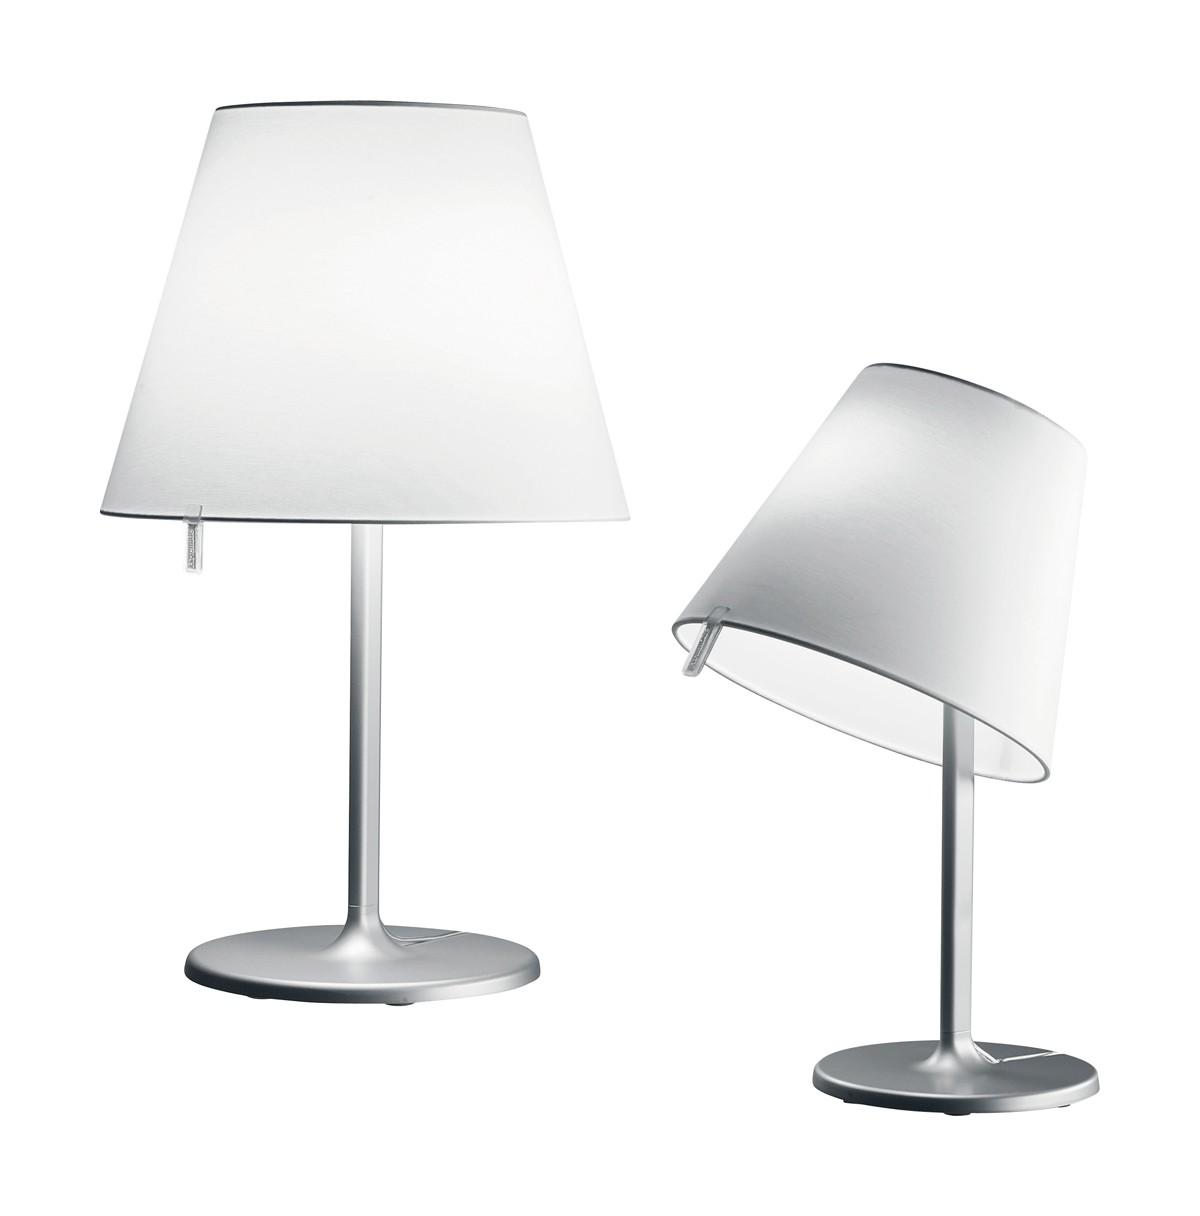 Lampe melampo tavalo d 39 artemide 3 finitions - Lampe artemide occasion ...